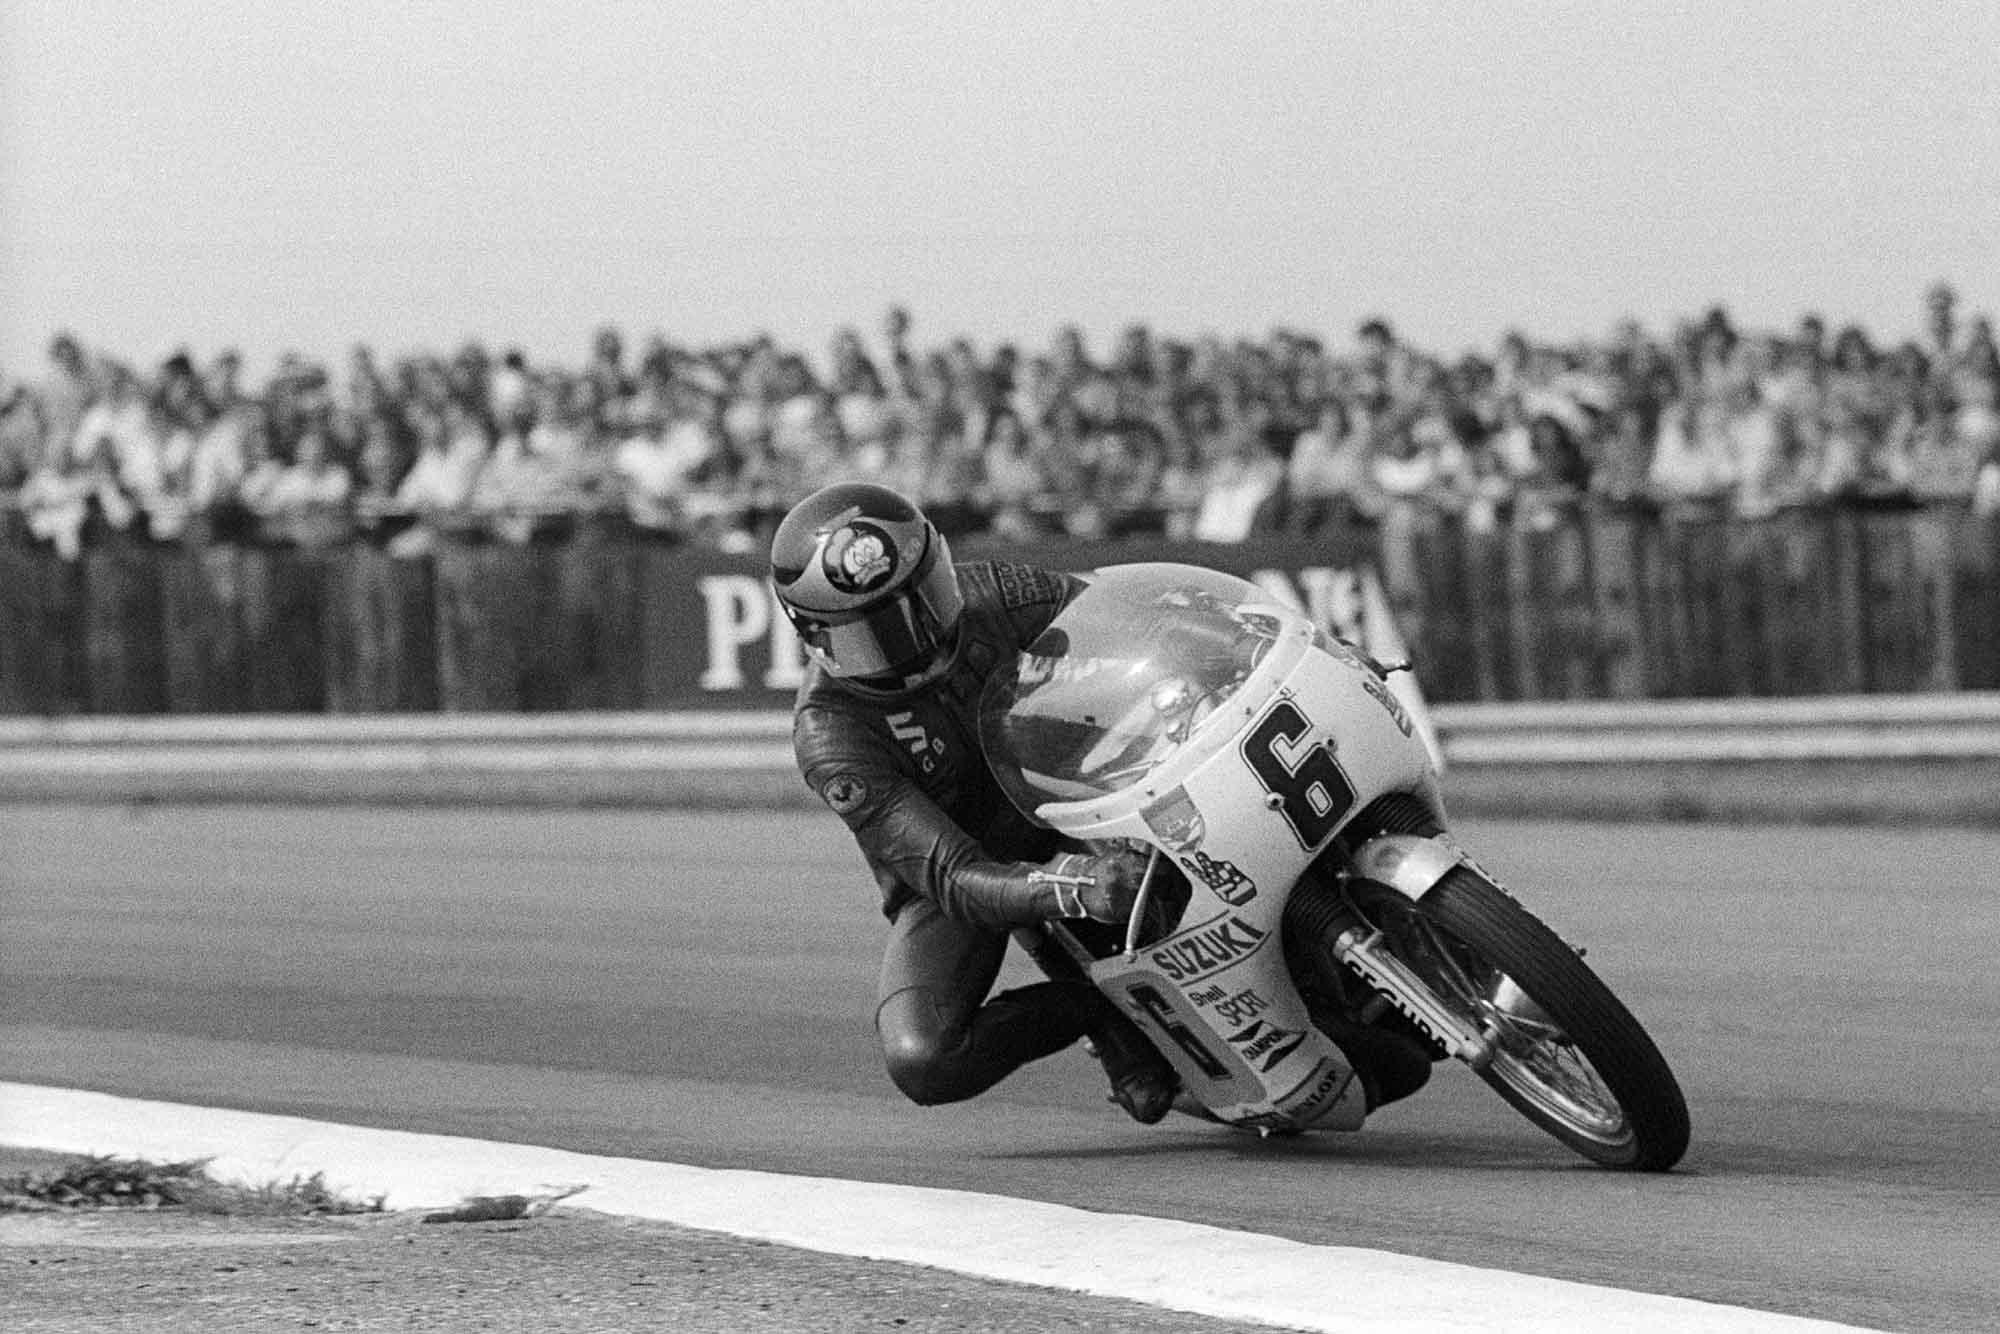 Barry Sheene on his Yamaha at 1973 British Grand Prix Silverstone